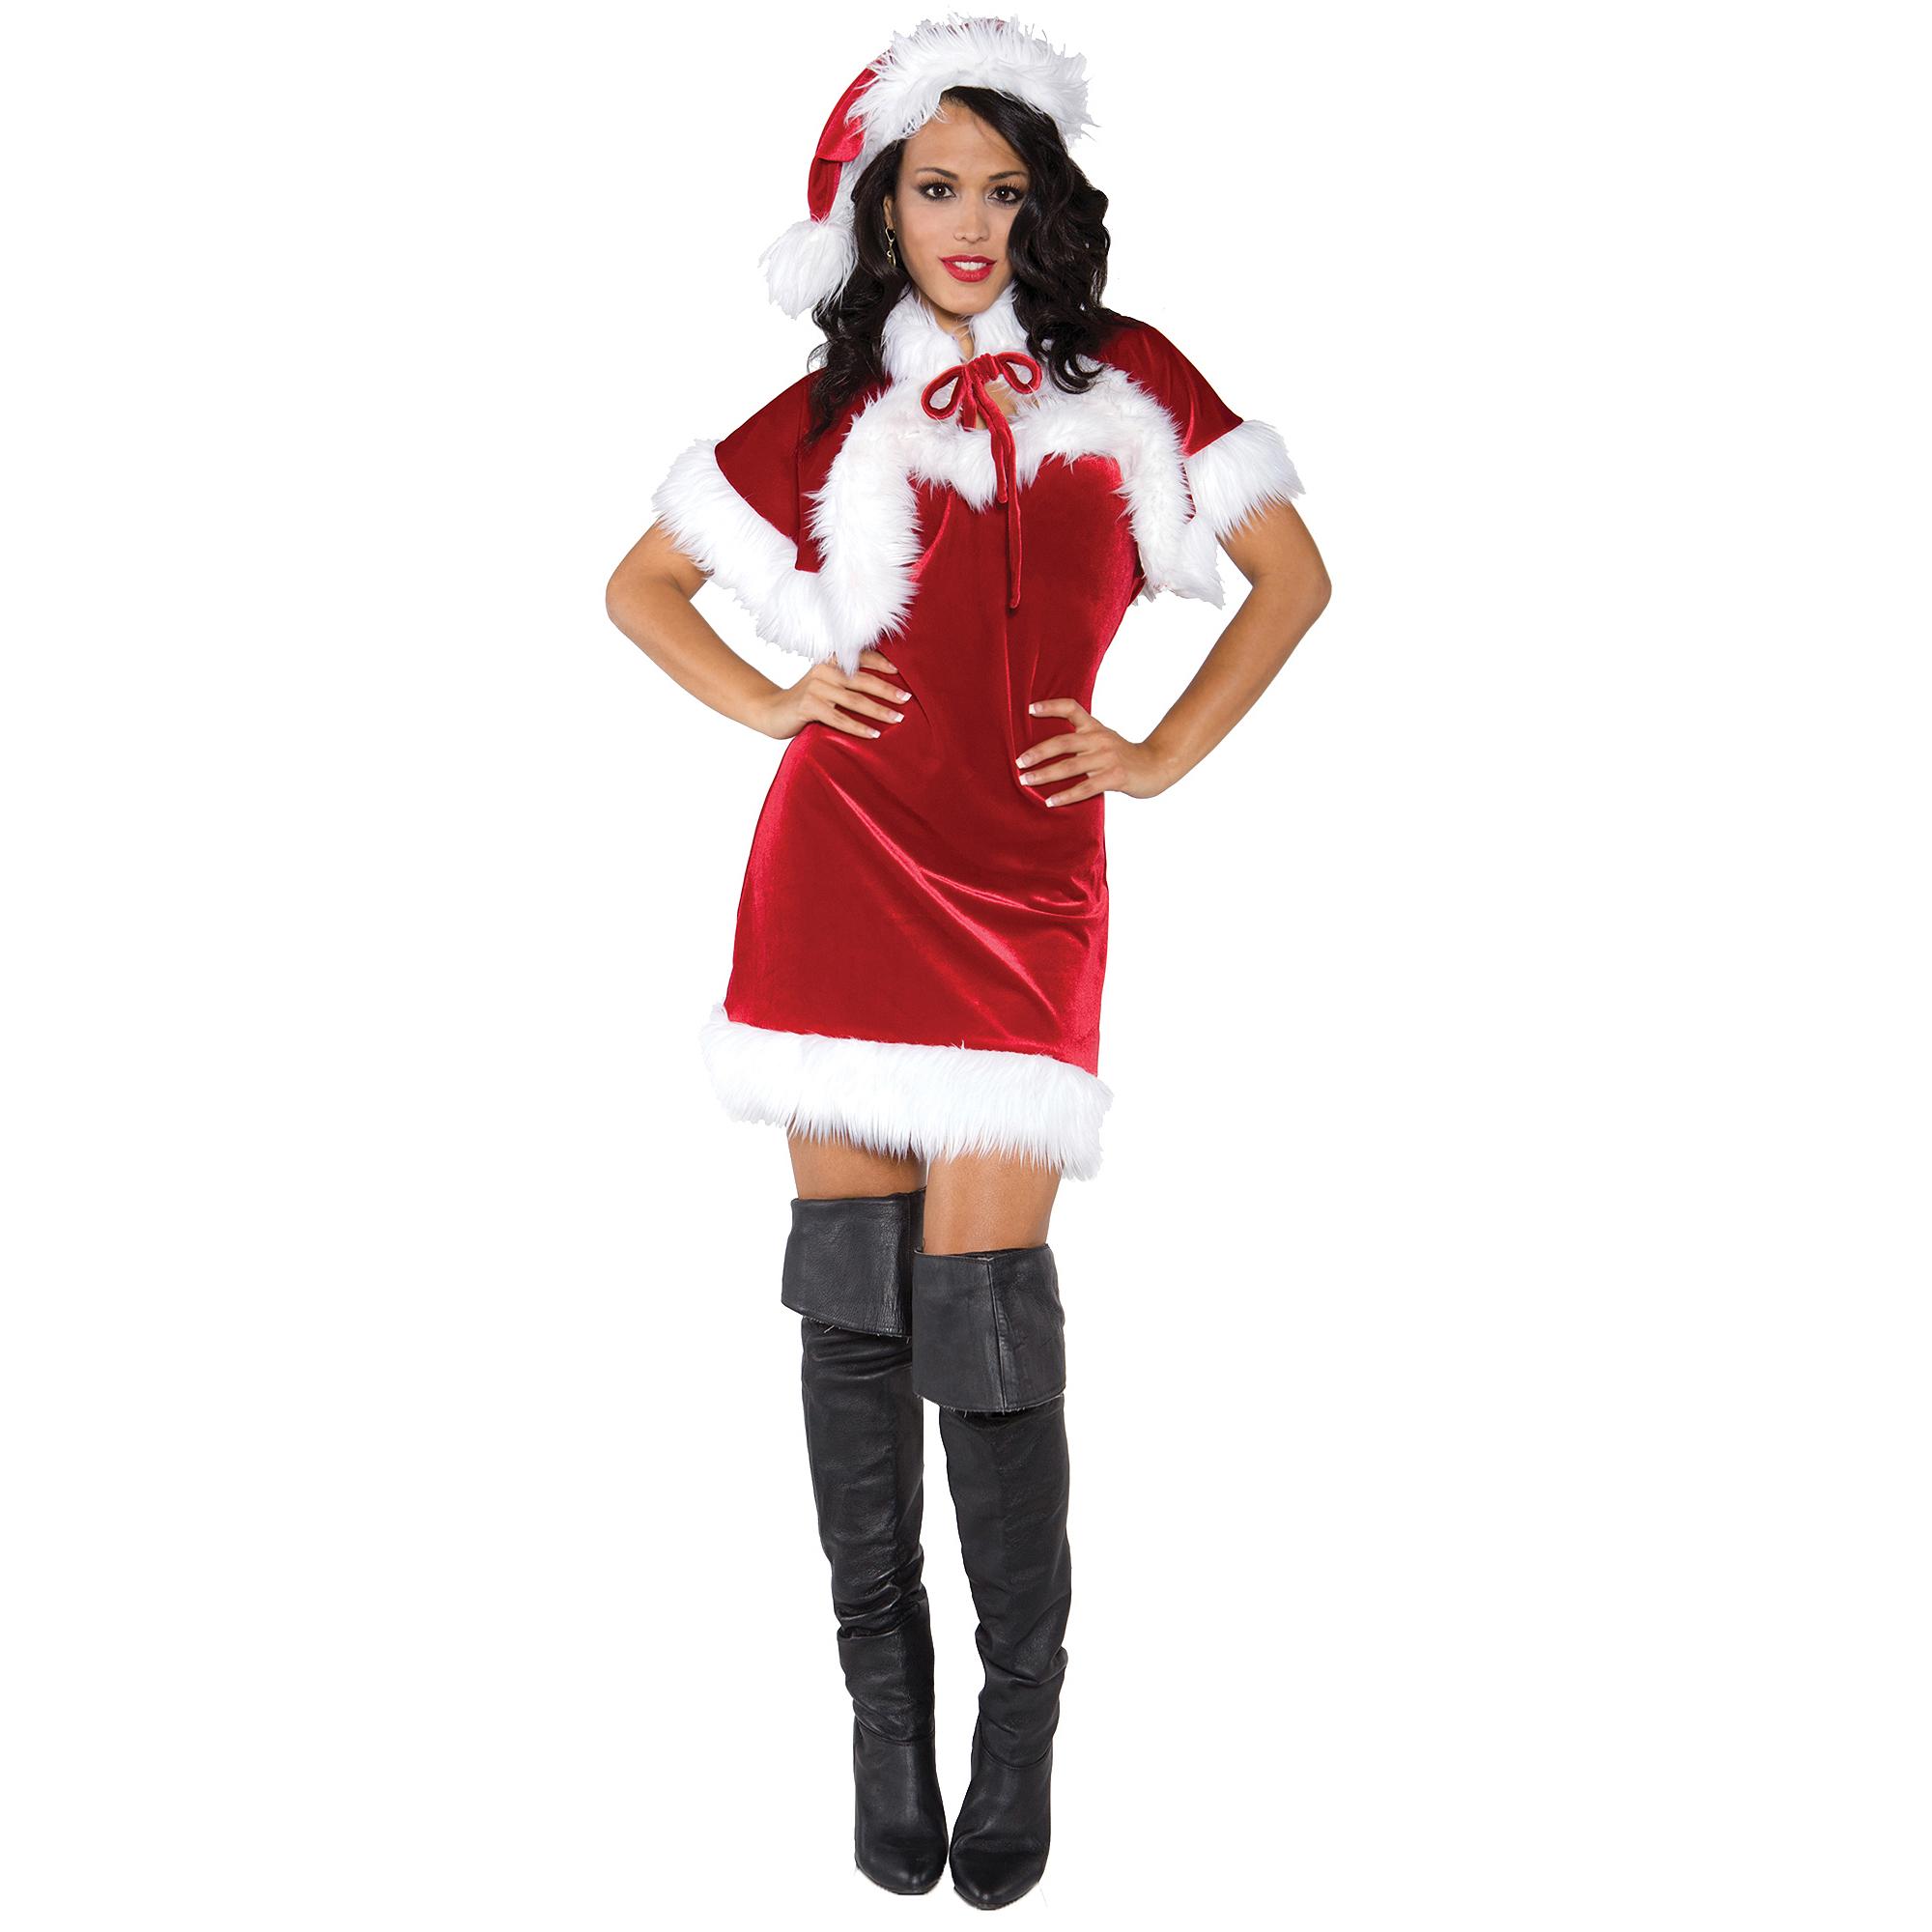 Merry Holiday Adult Halloween Costume